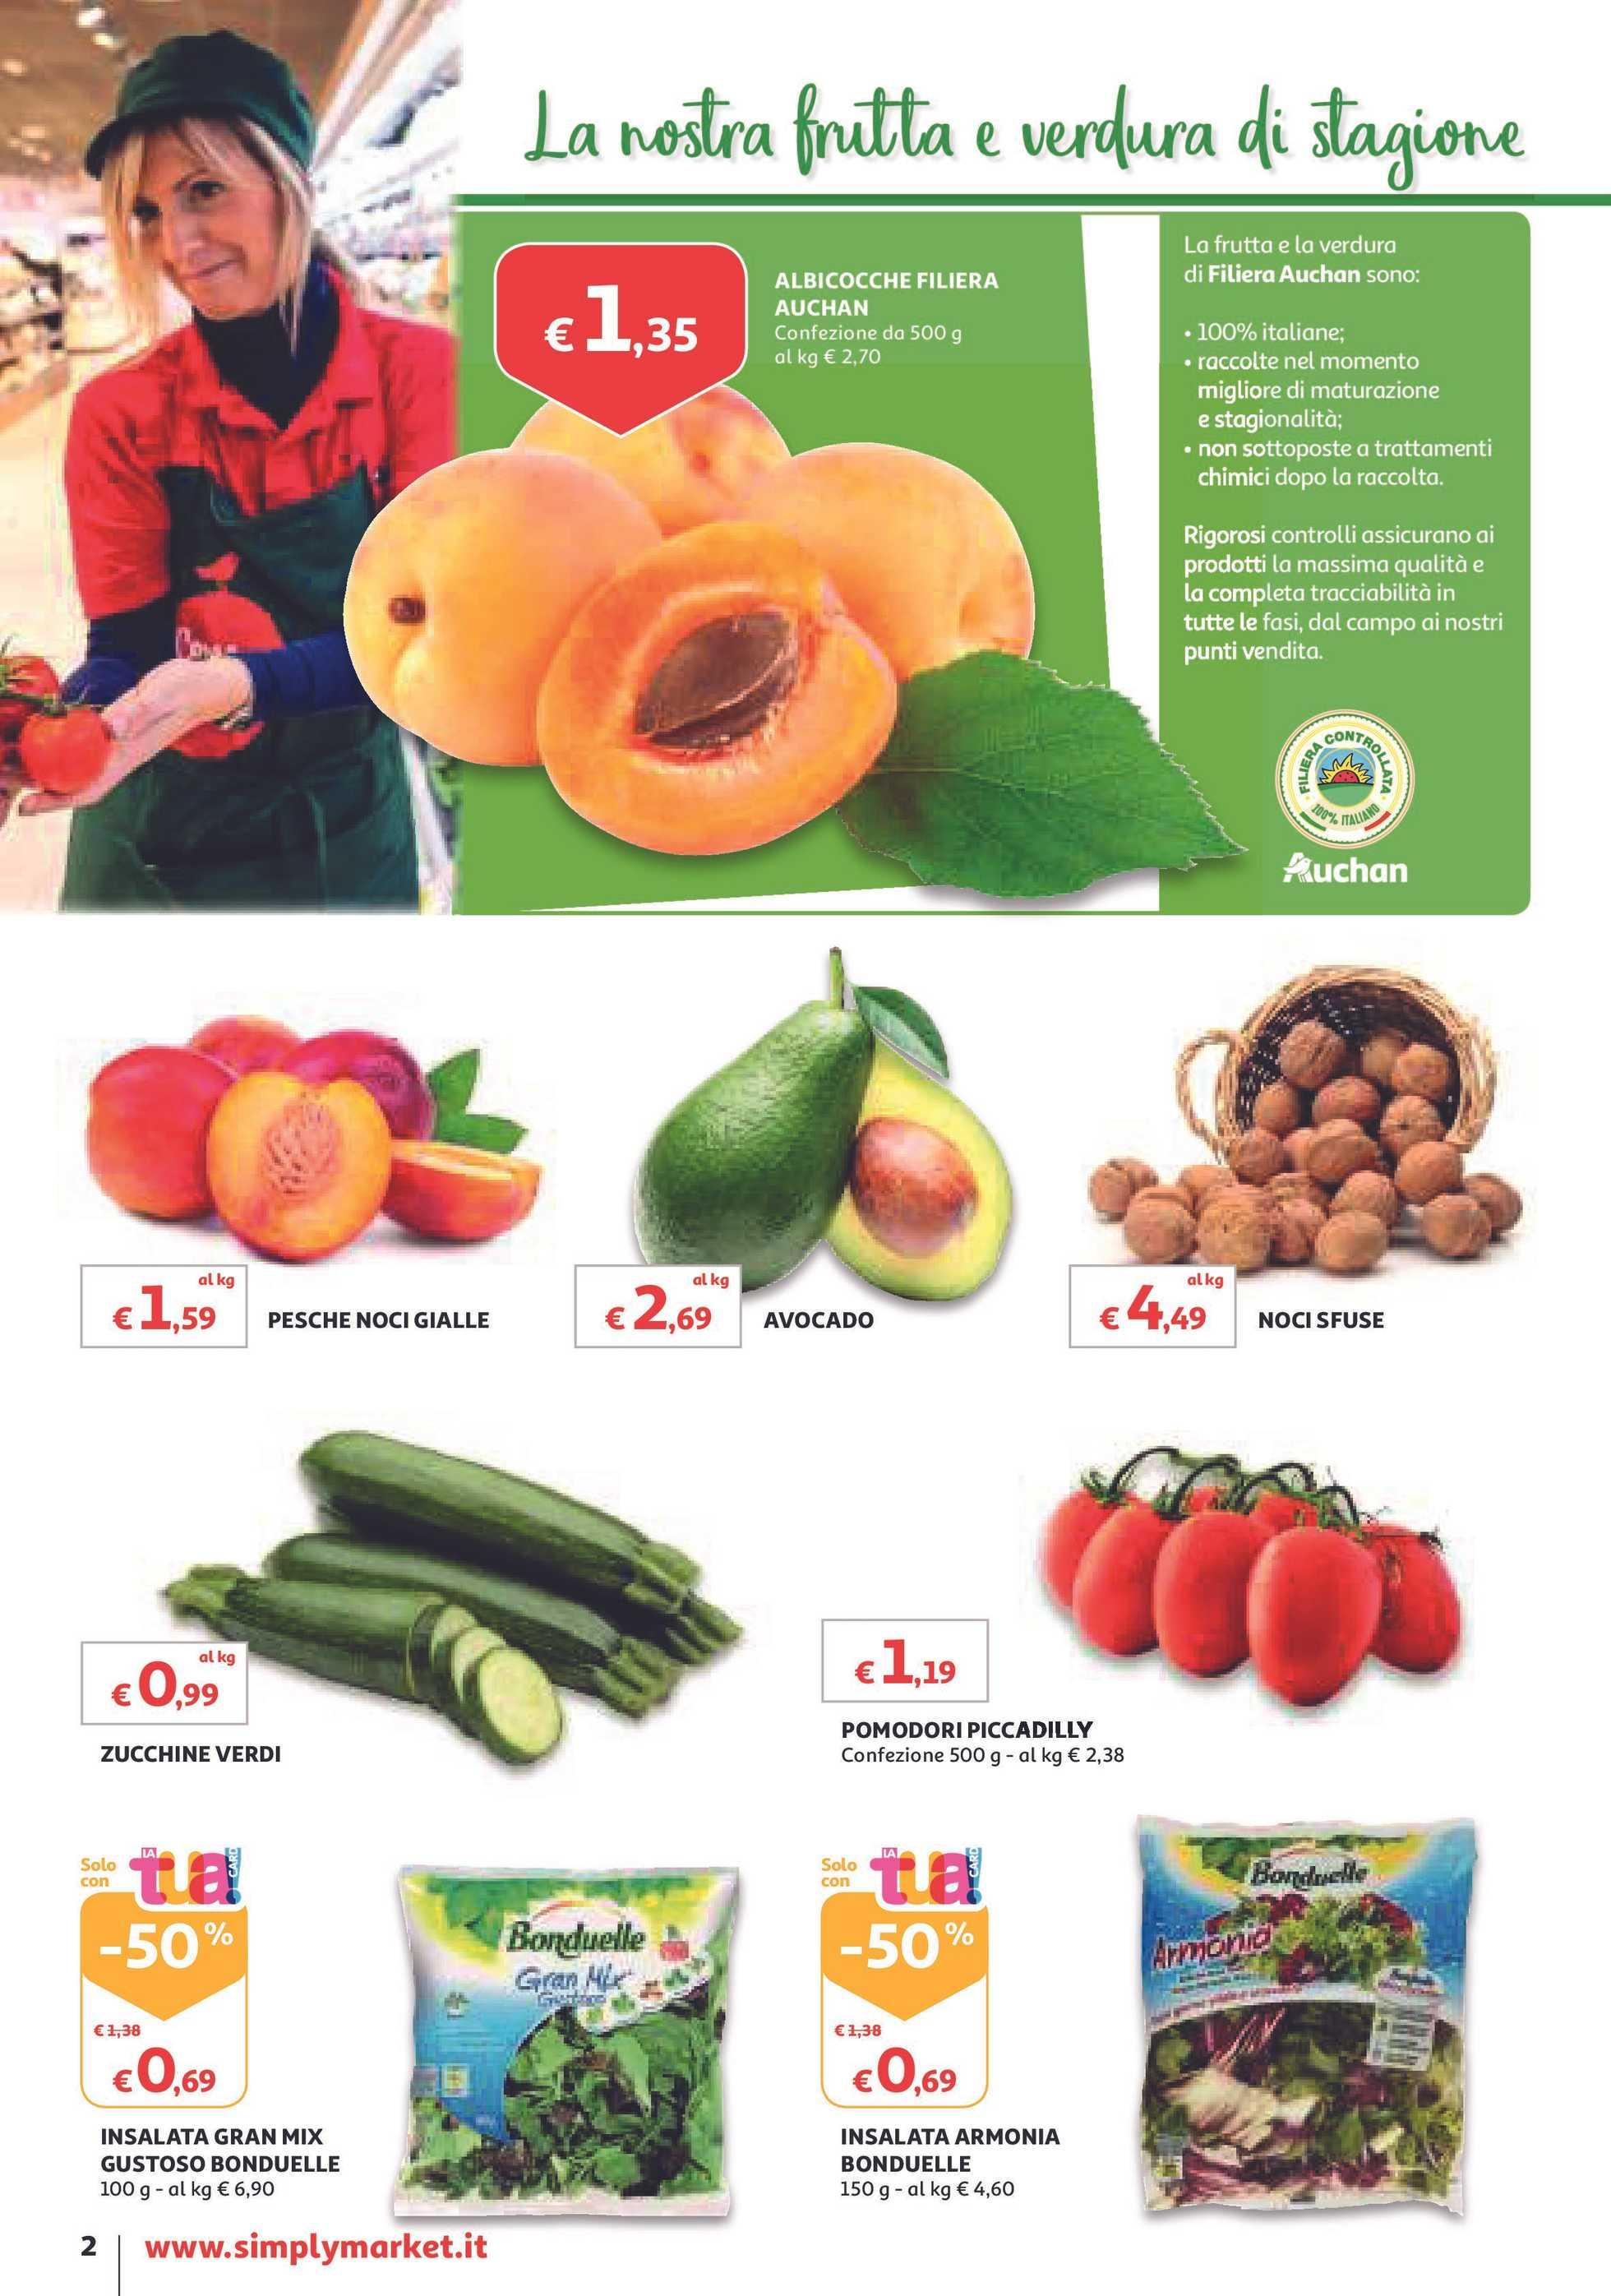 Simply Market - offerte valide dal 01.07.2019 al 10.07.2019 - pagina 2.